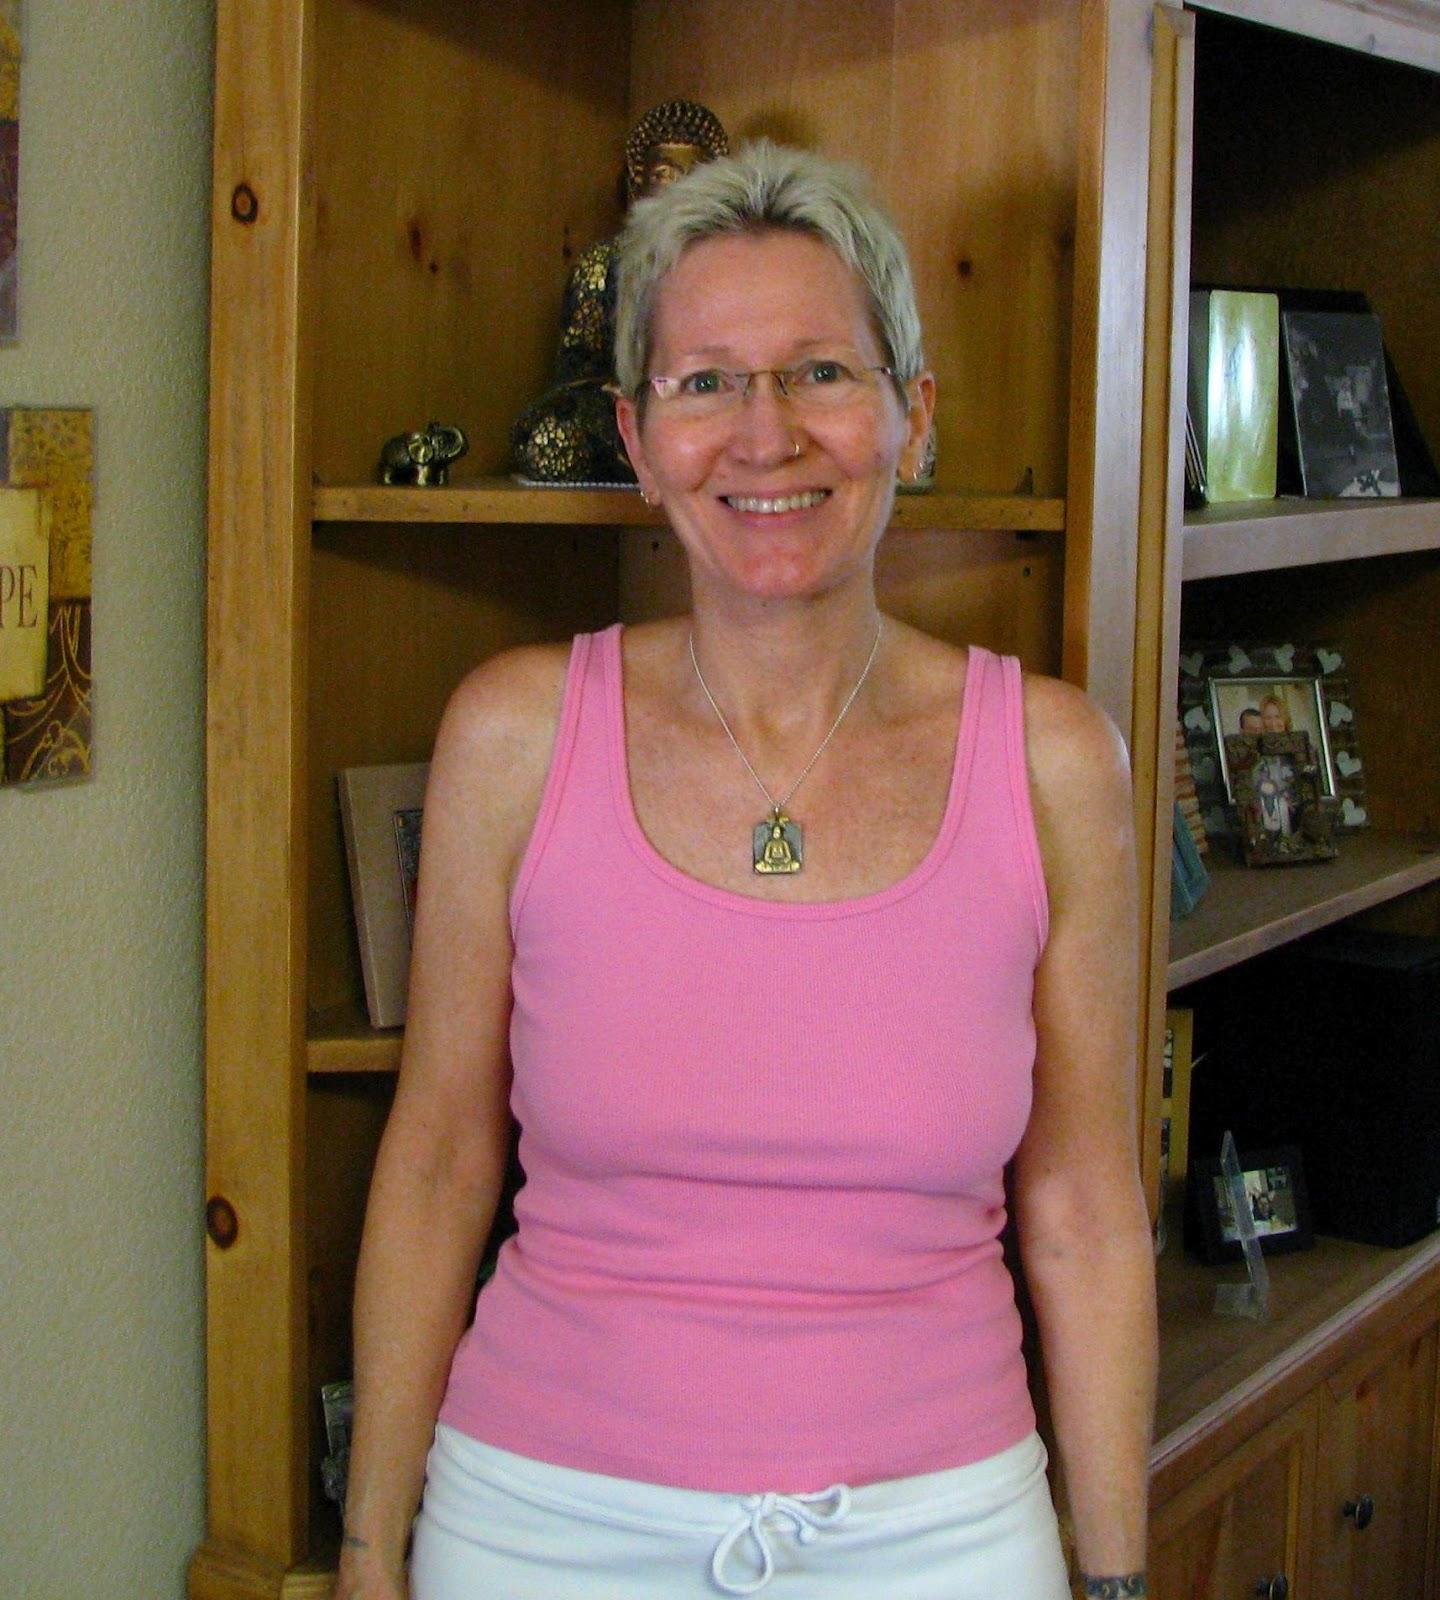 rocki's rock'n blog: mastectomy photos without reconstruction